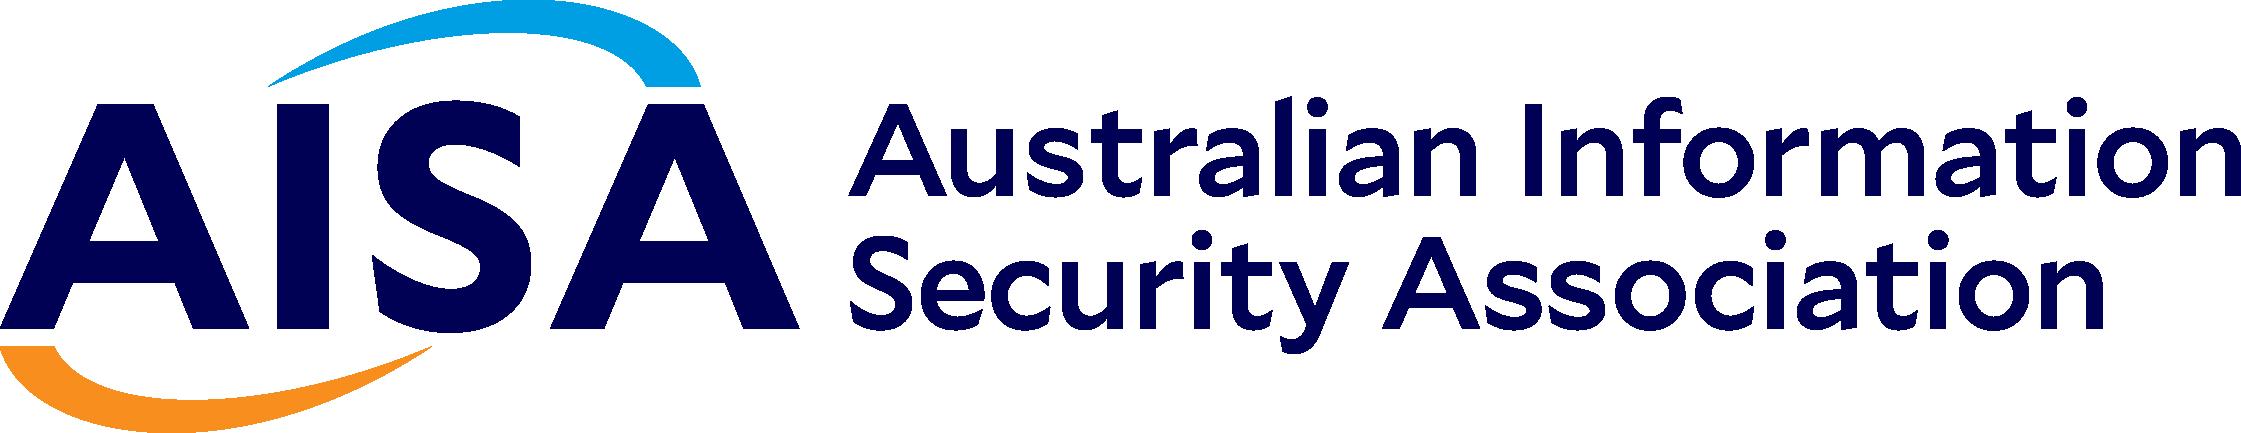 Logo AISA Australian Information Security Association